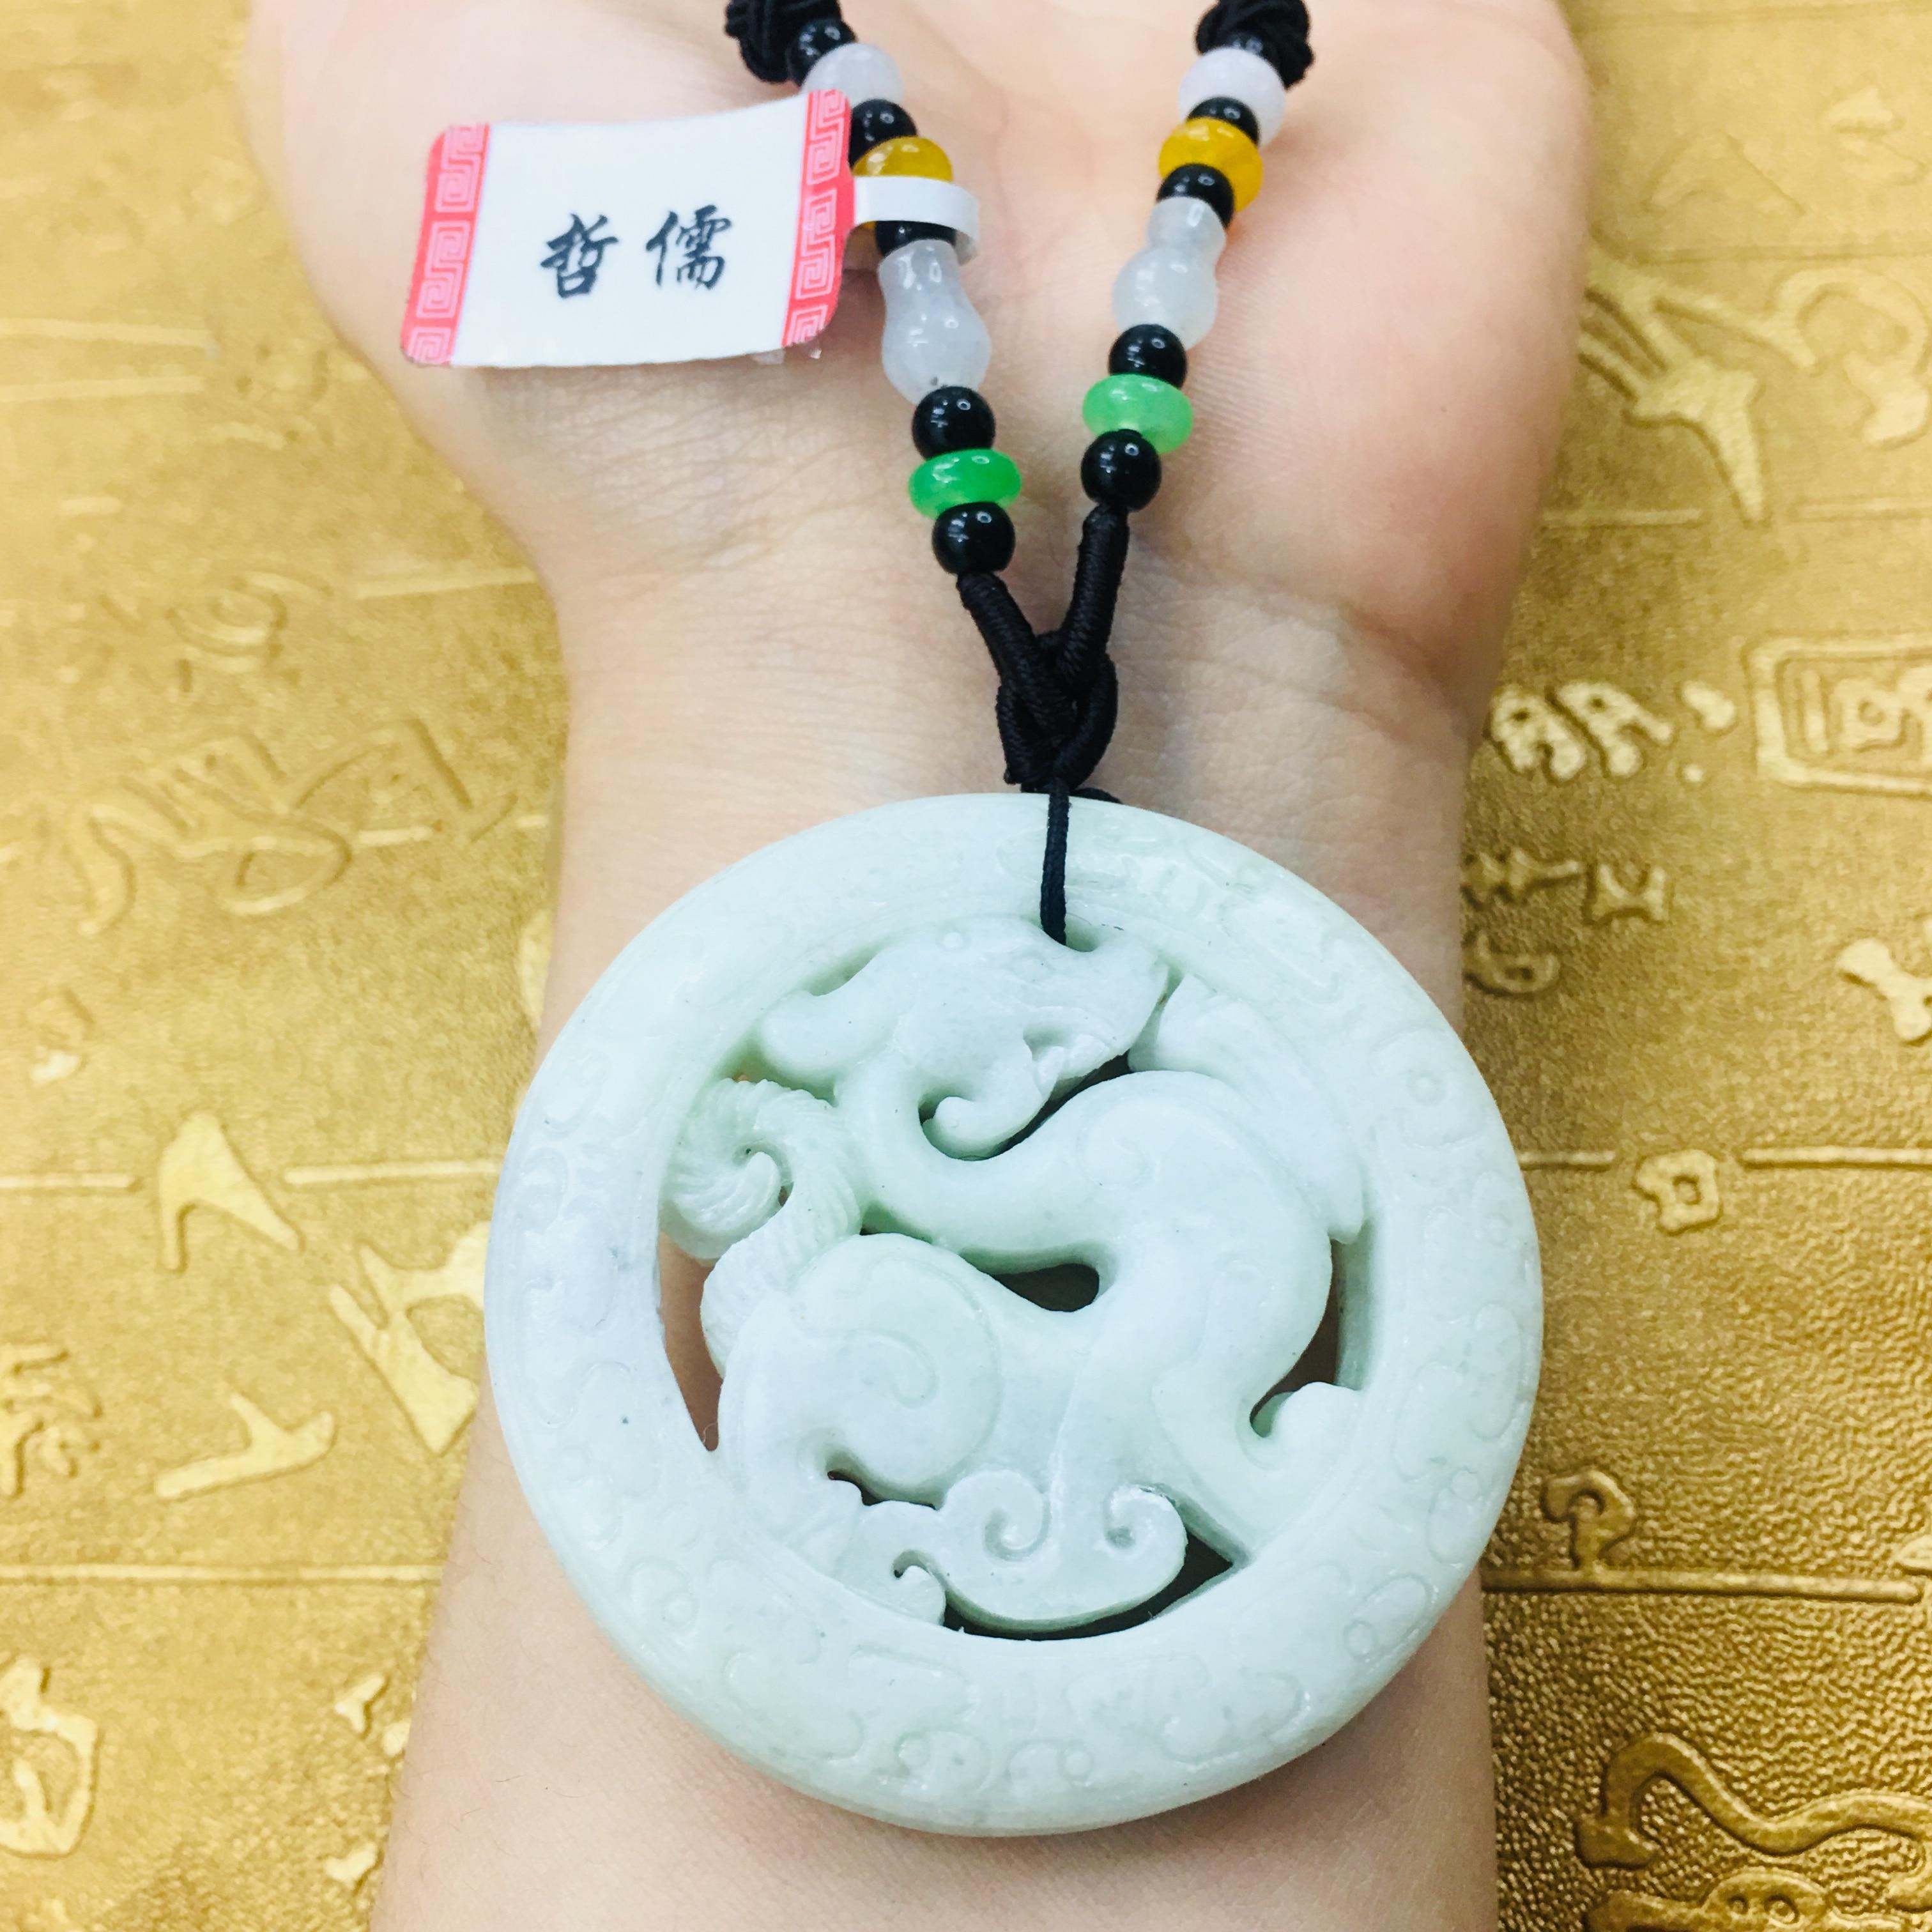 Dragon Phoenix Natura Exquisite White Natural Hand-carved Chinese Jade Pendant